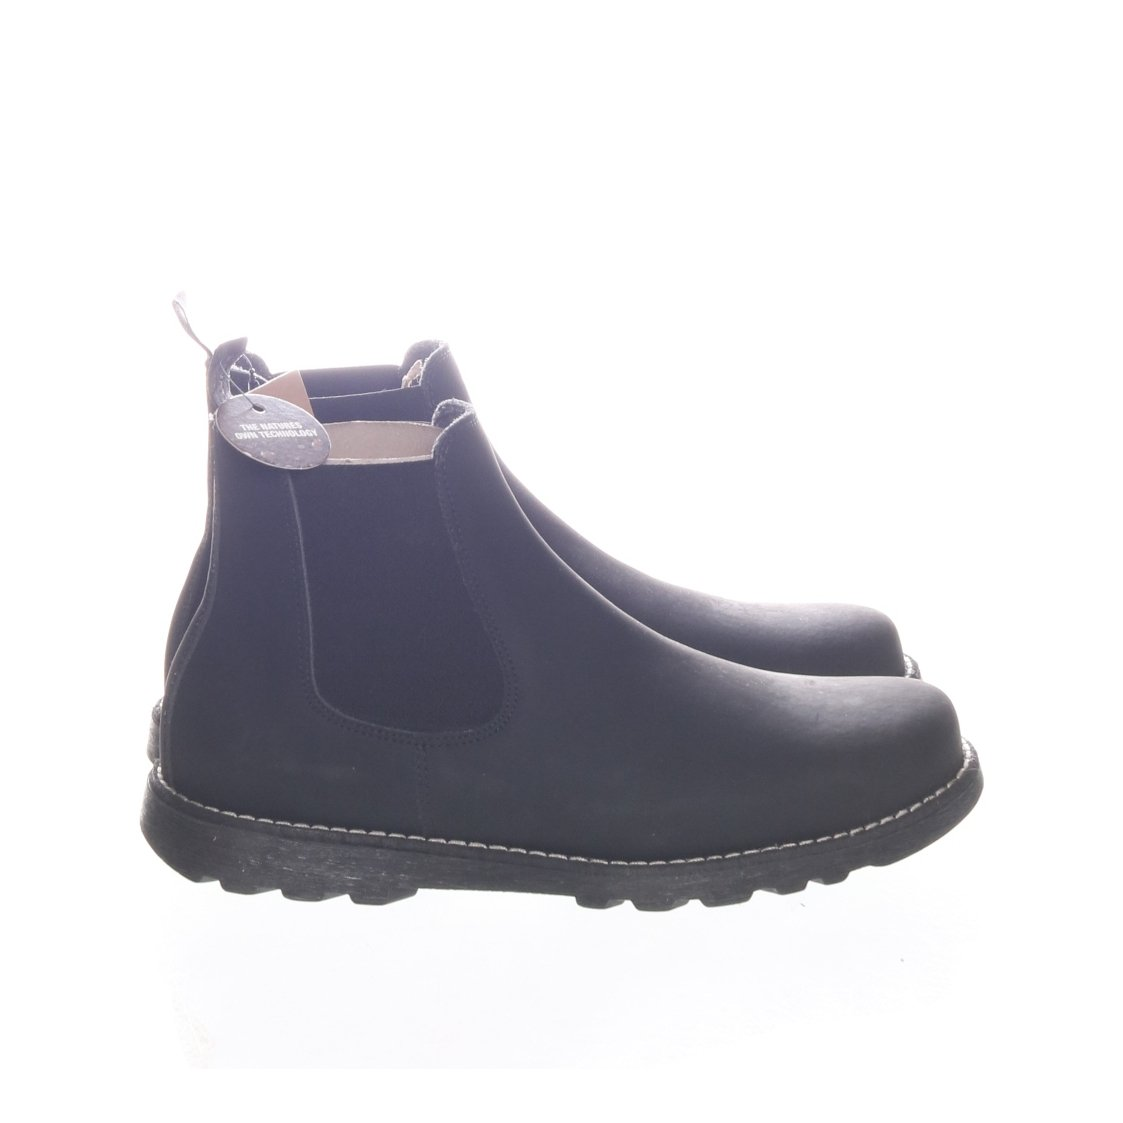 Kavat, Boots, Strl: 41, Bodås XC, Svart, Skinn